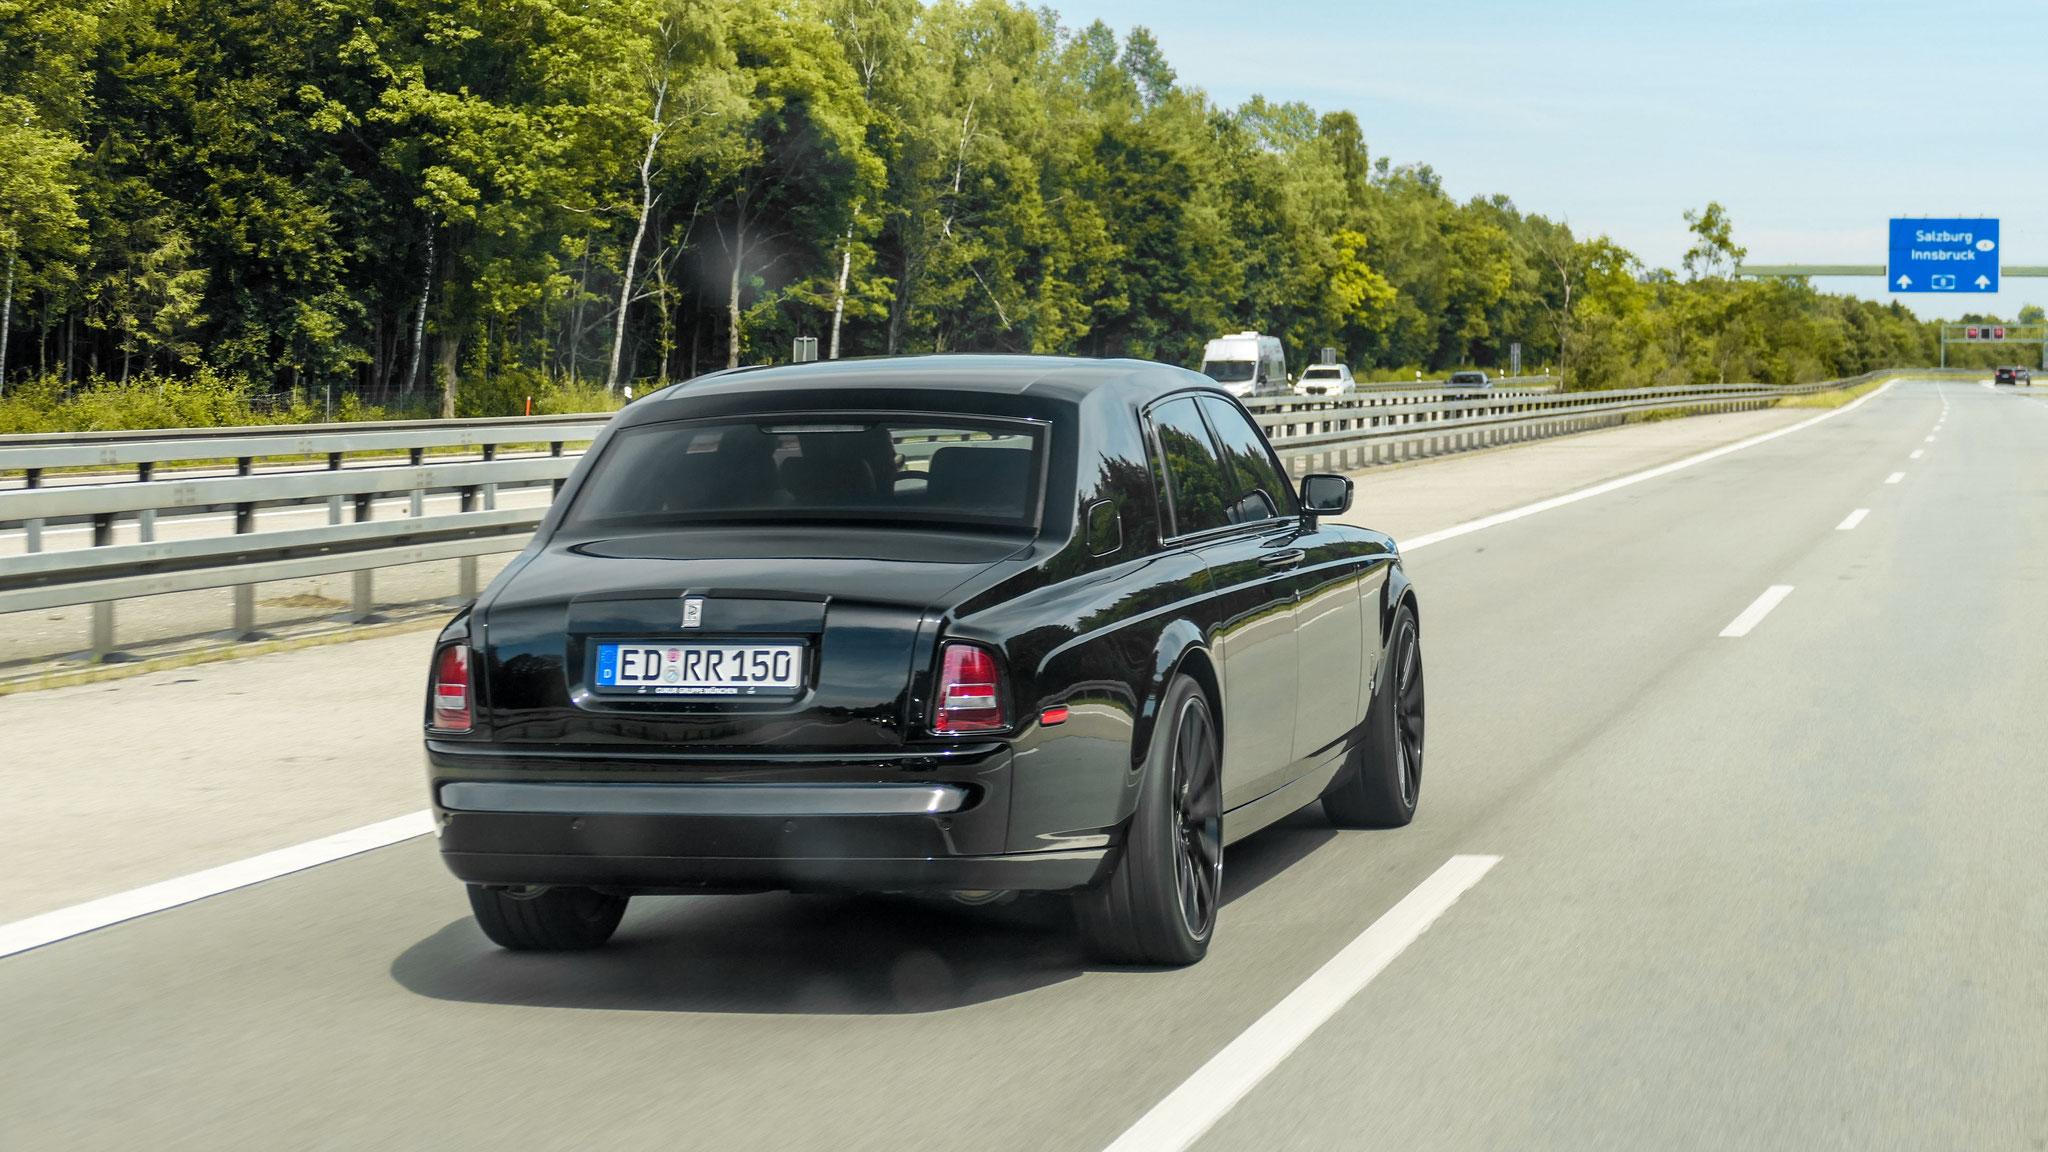 Rolls Royce Phantom - ED-RR-150